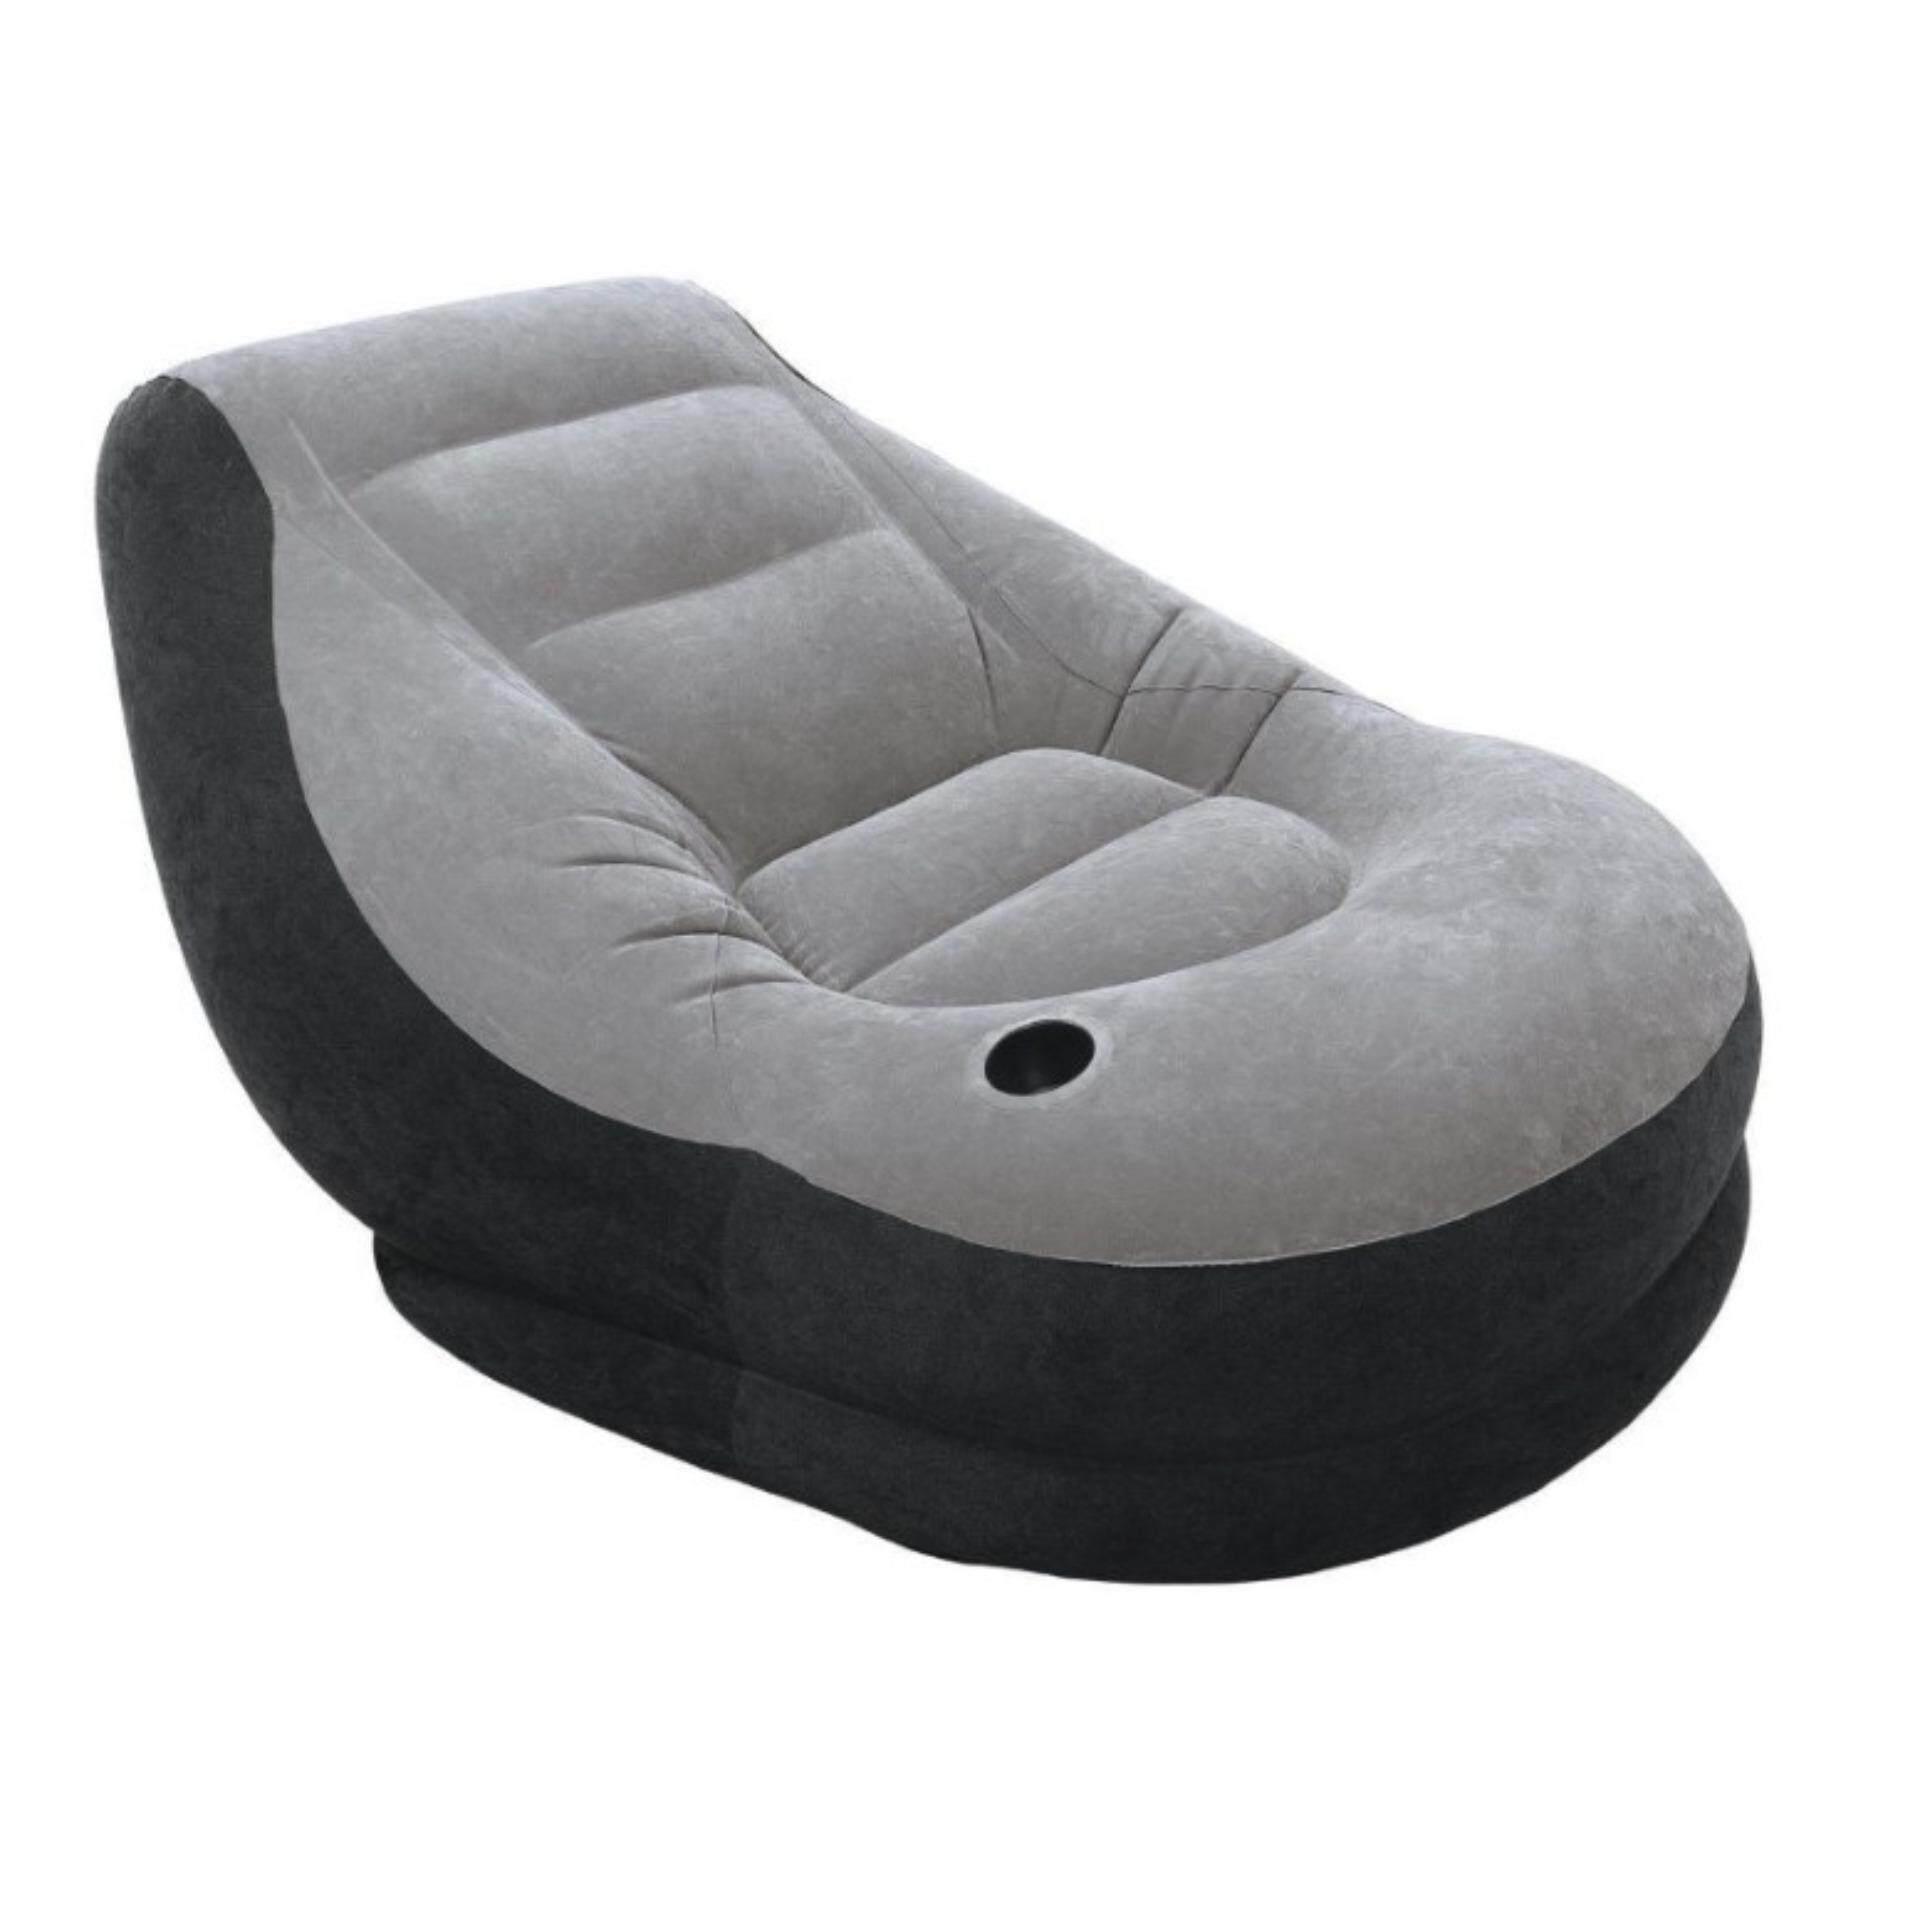 Intex Lounge Inflatable Chair Sofa Dorm Gaming Chair 68564